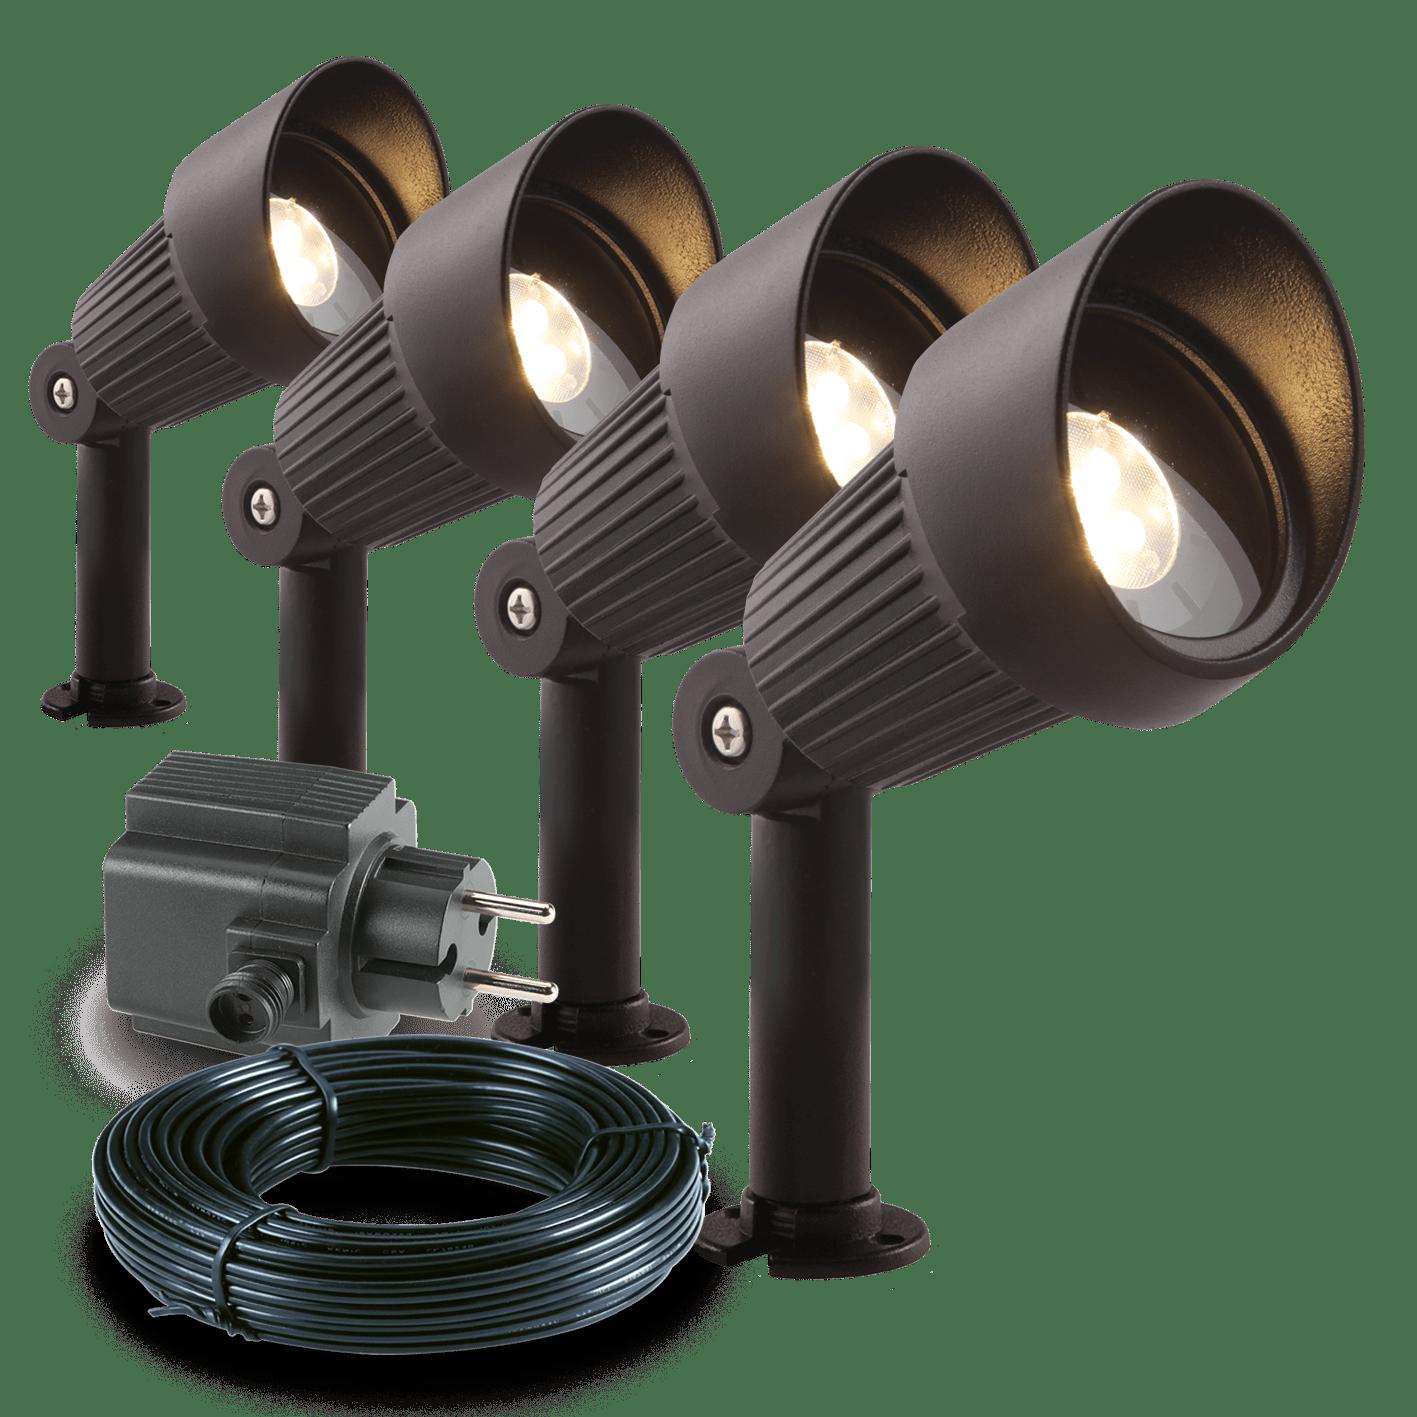 Garden Lights Buitenlamp Focus LED Set 4 Stuks | Tuinverlichting